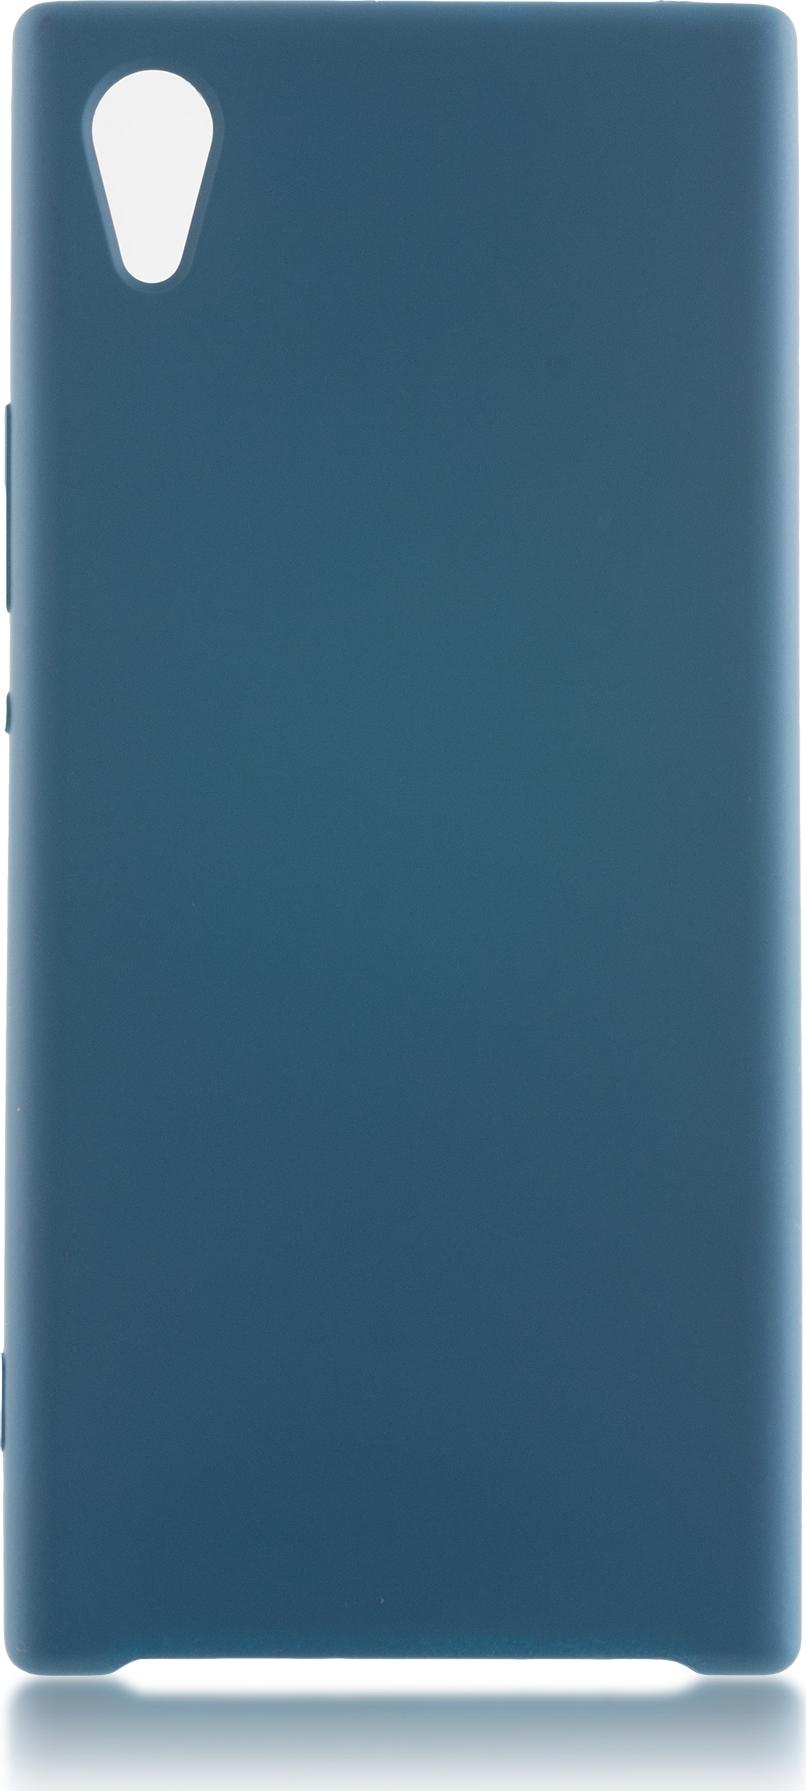 Чехол Brosco Softrubber для Sony Xperia XA1, бирюзовый